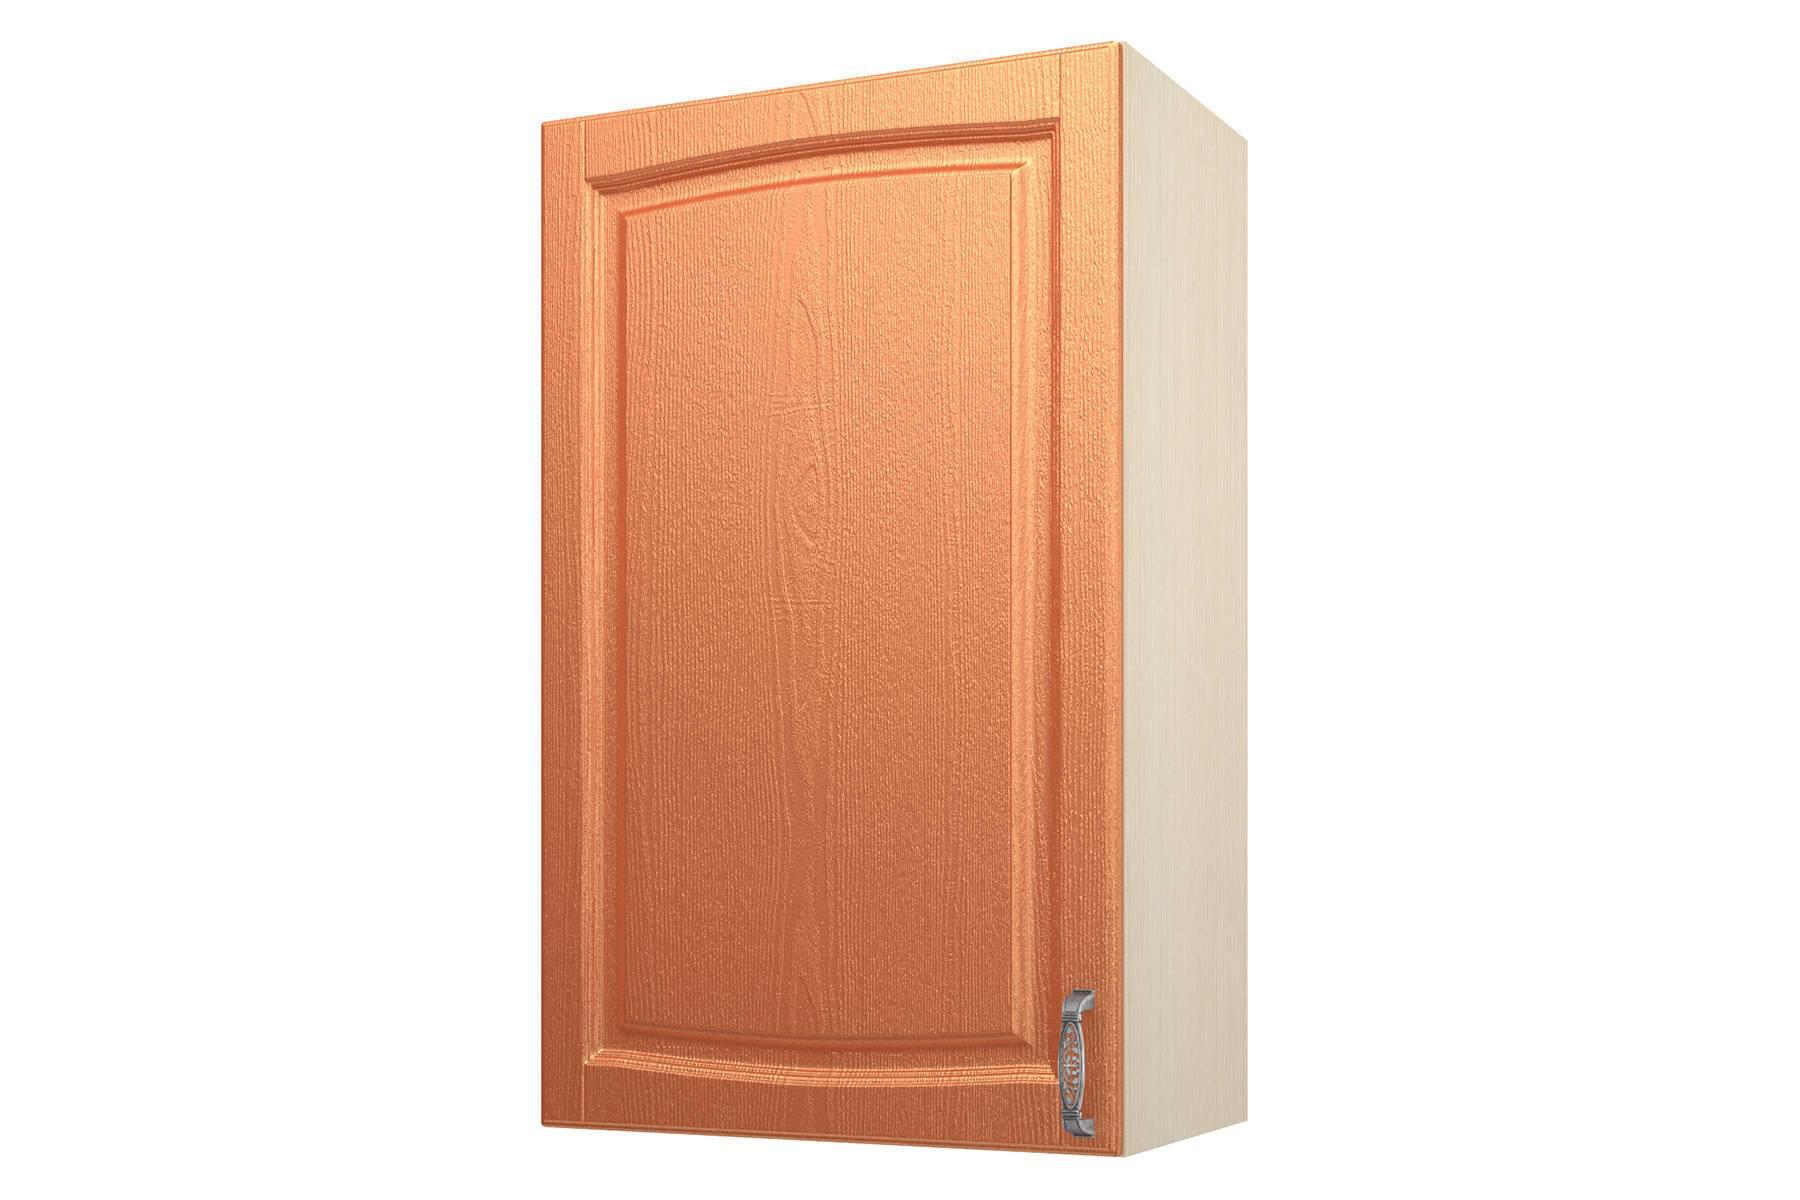 Равенна ART Шкаф навесной 60, (Н-96), 1 дверь равенна art шкаф навесной 40 н 96 1 дверь